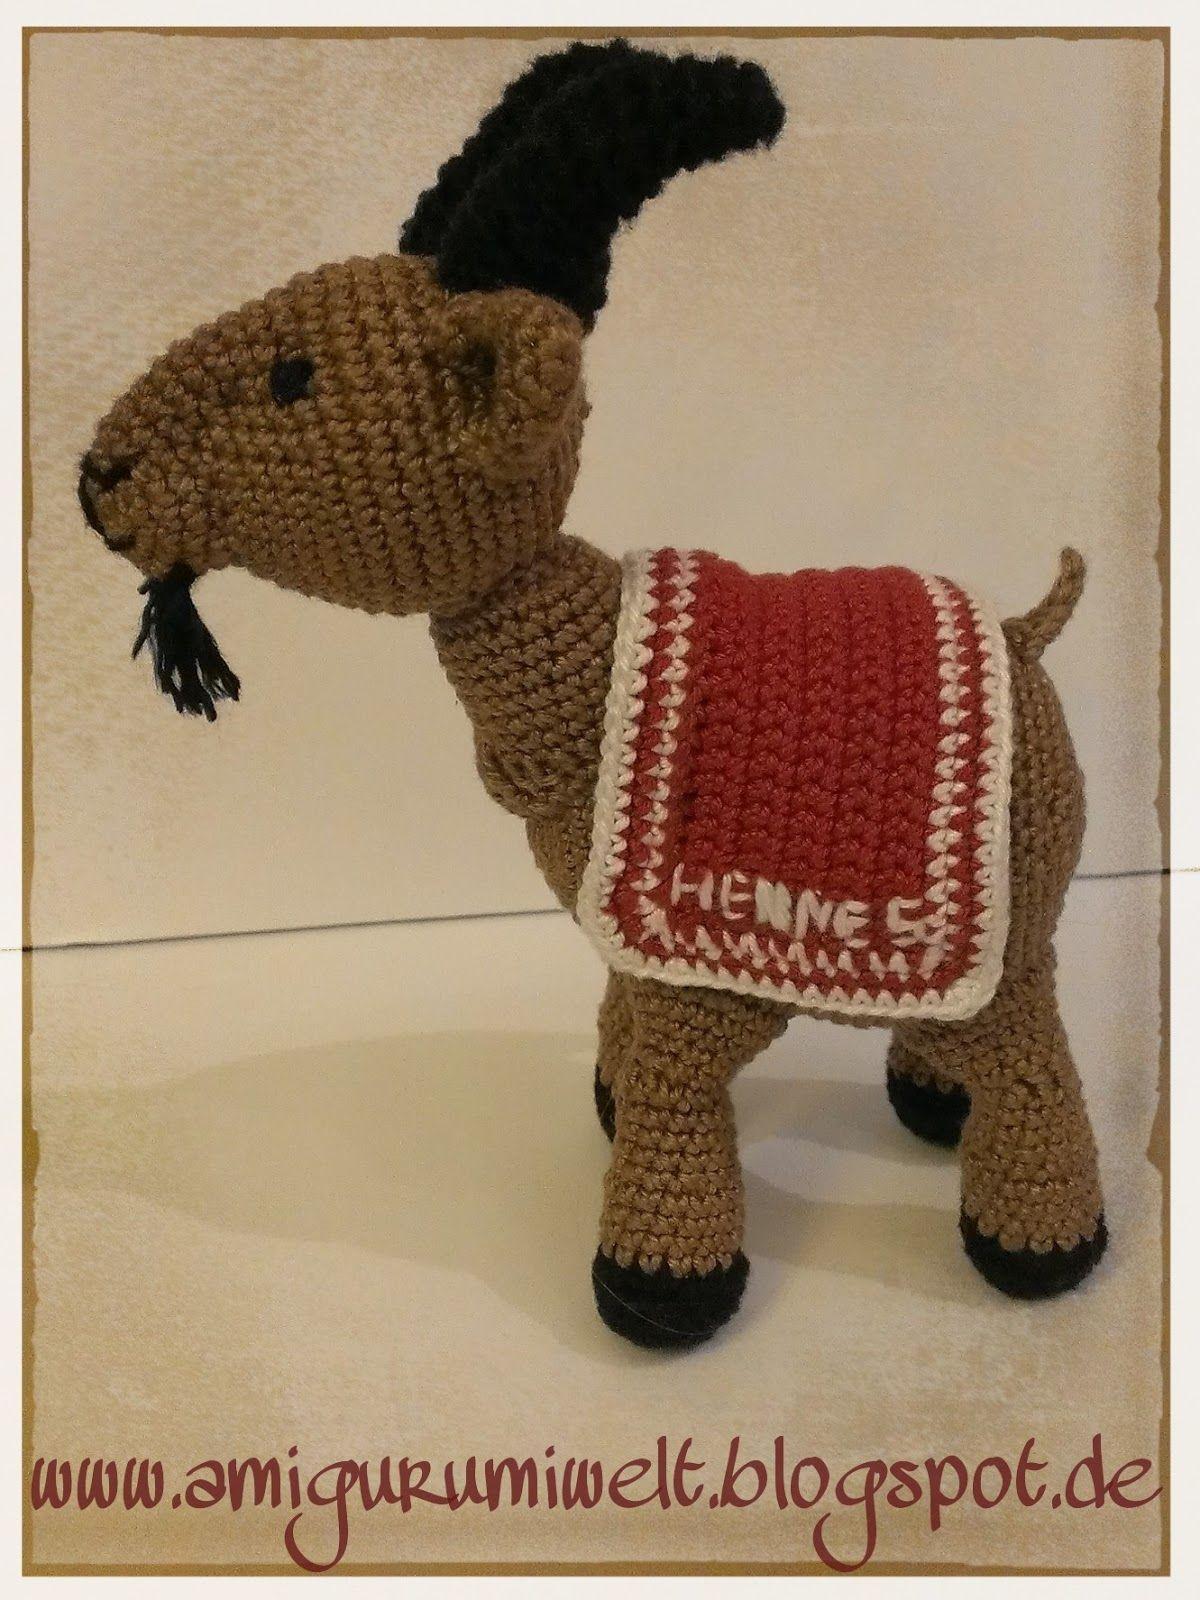 amigurumi geißbock hennes köln kostenlos crochet | Häkeln & Stricken ...